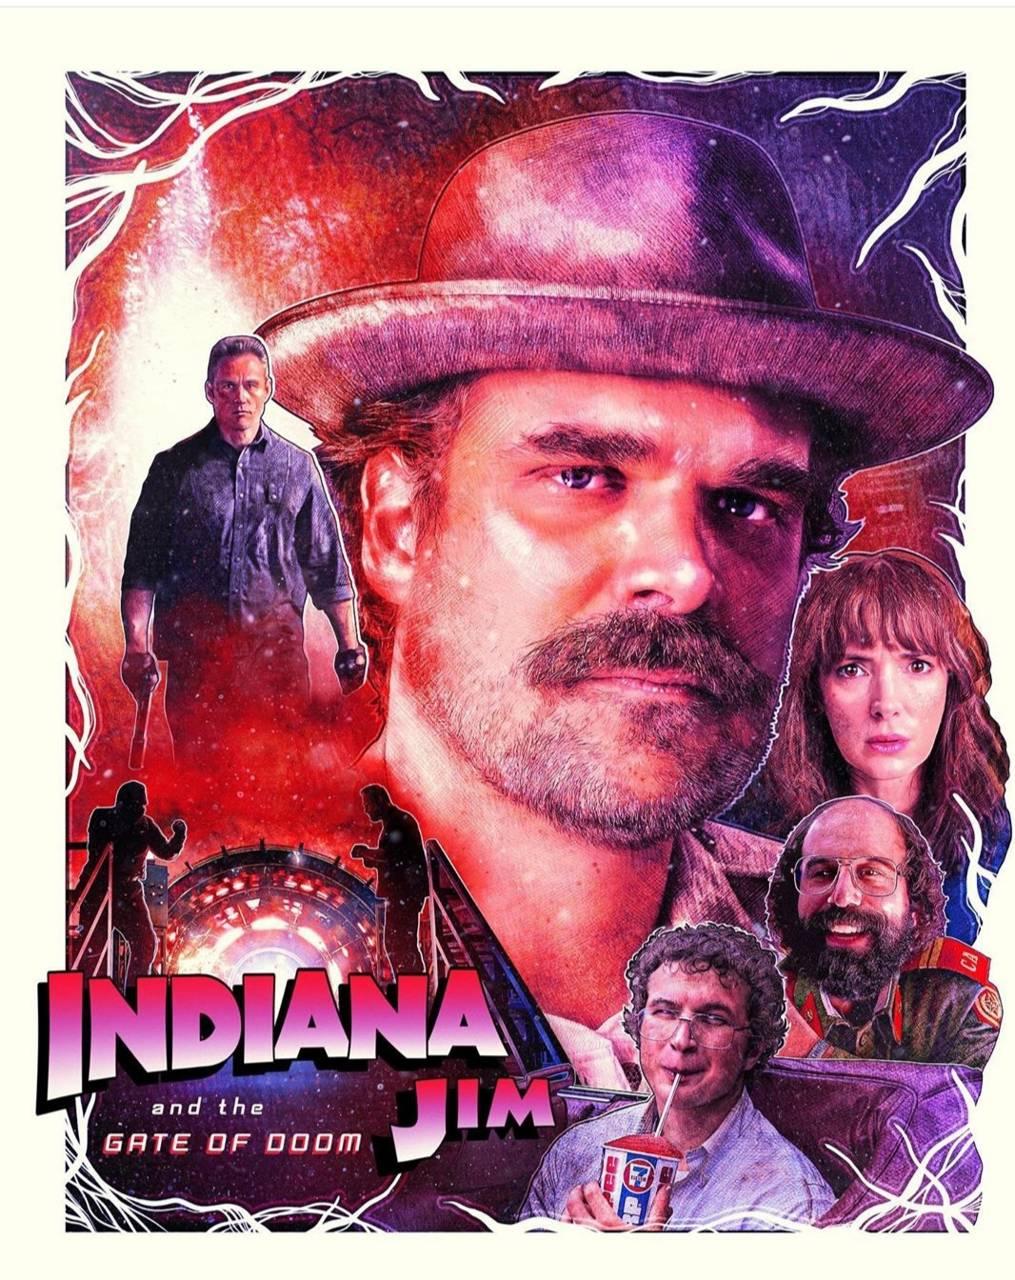 Indiana Jim